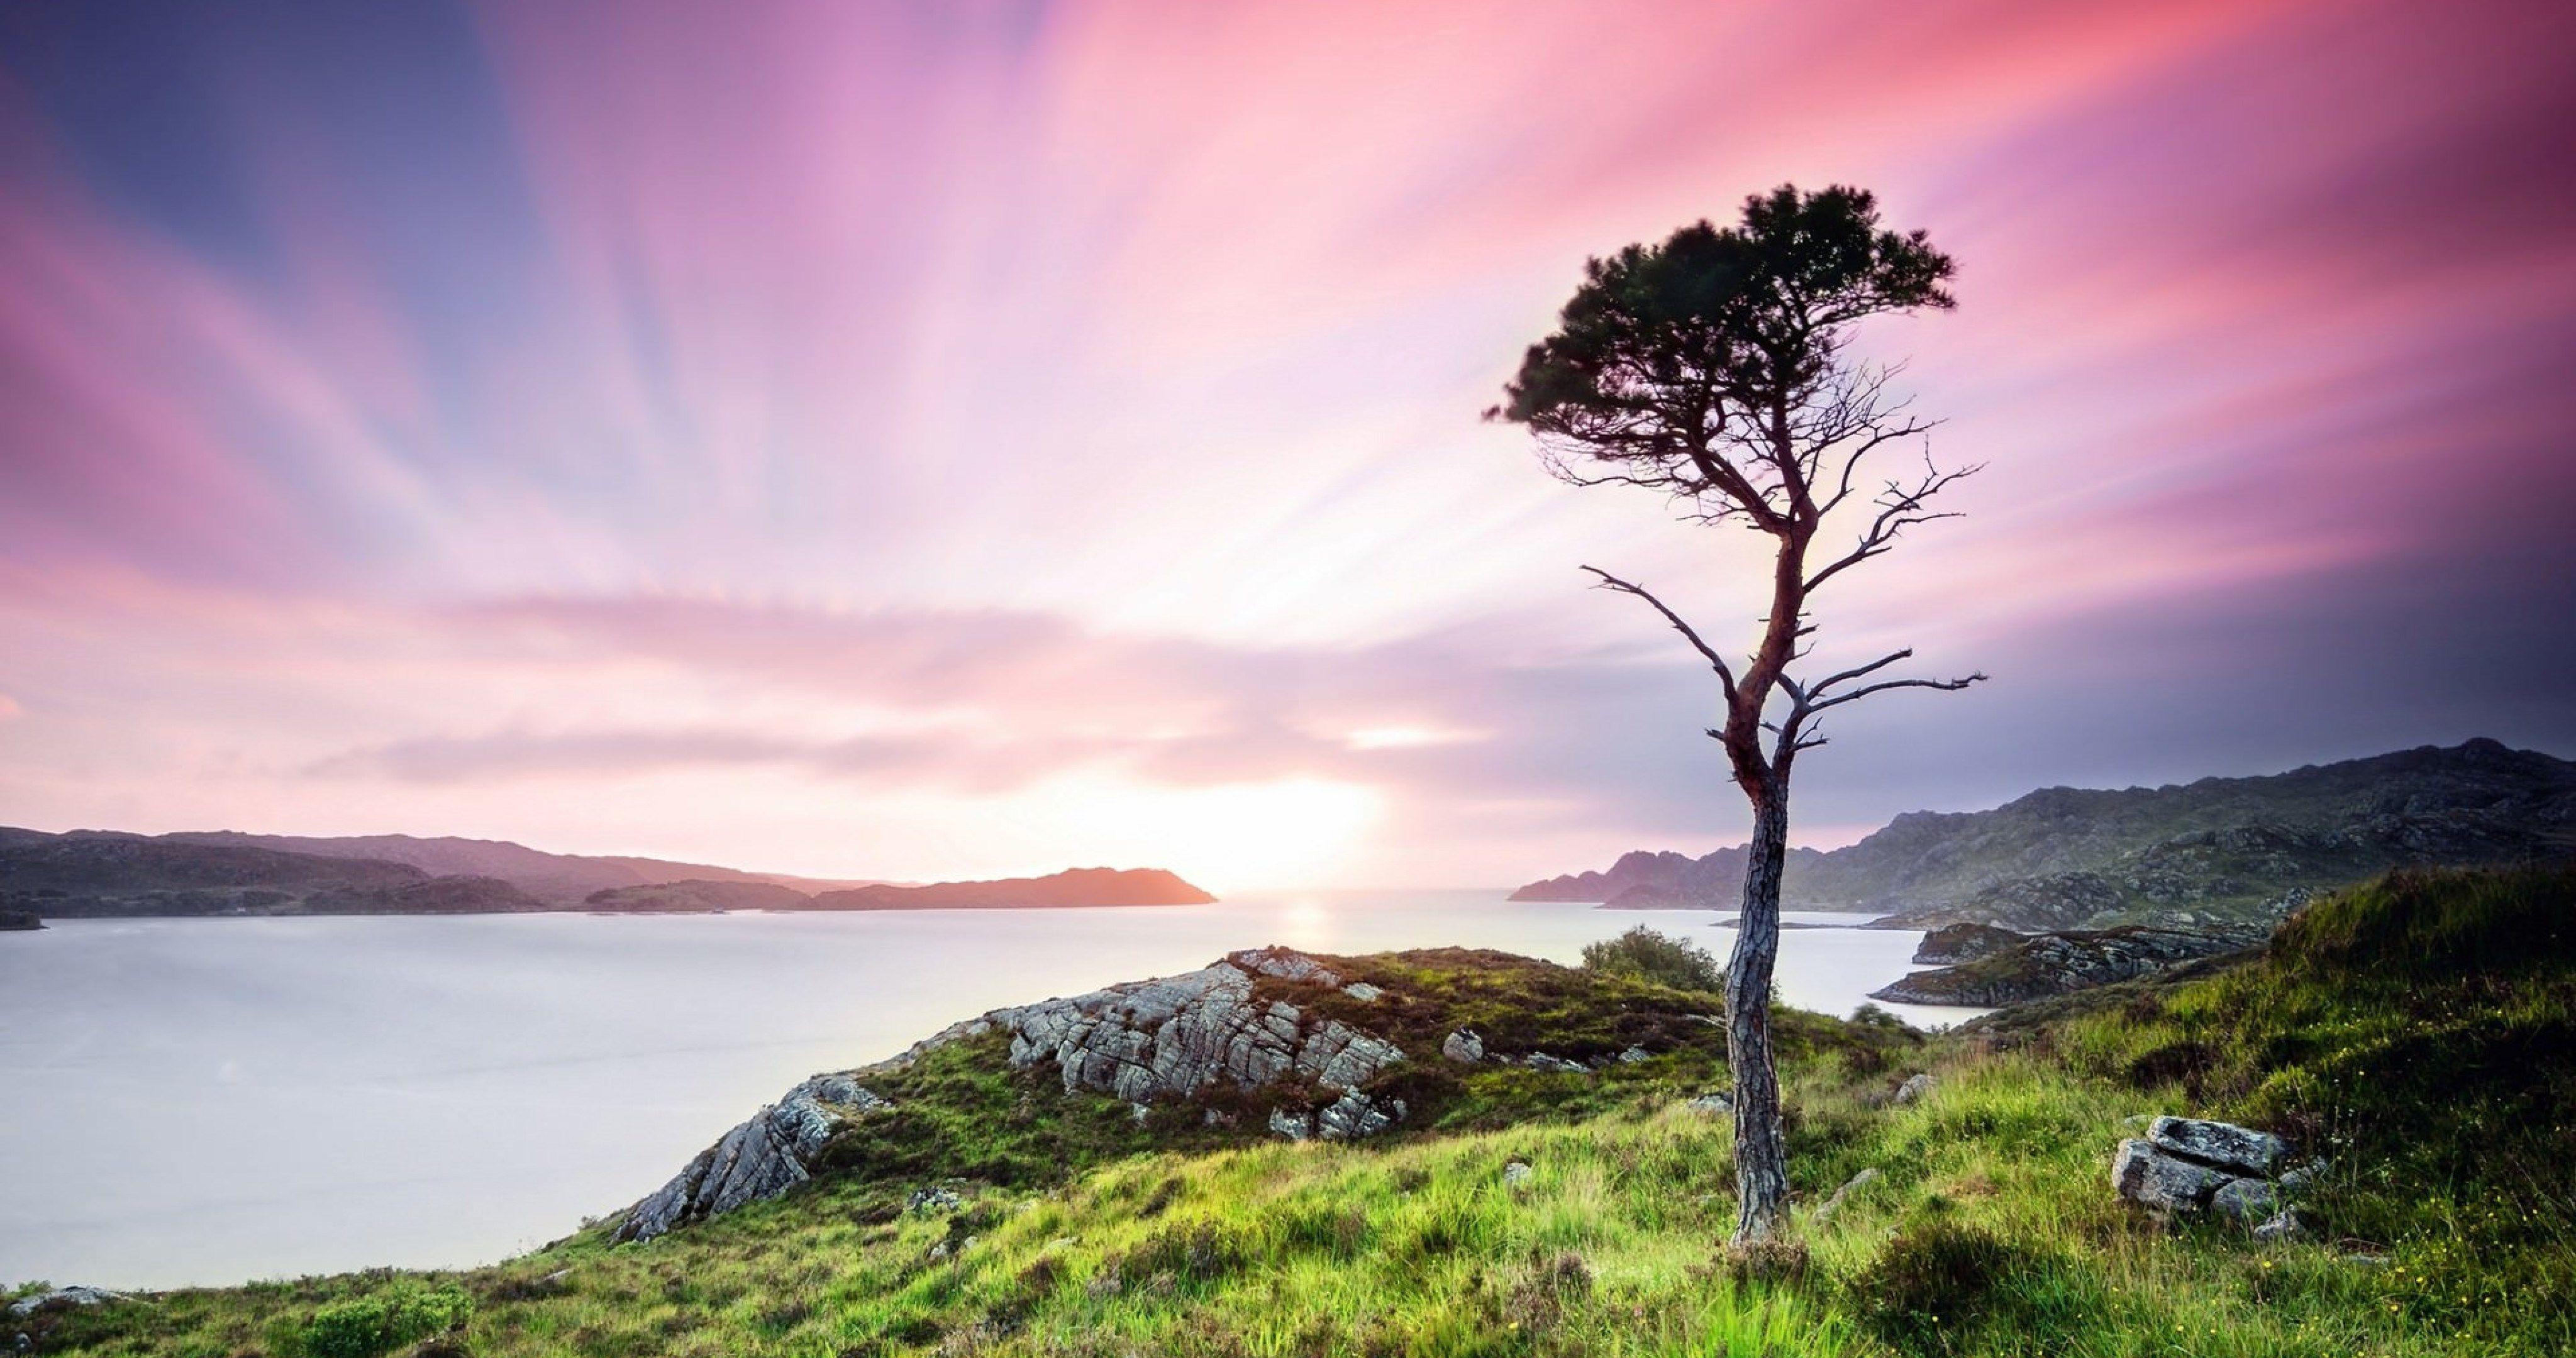 united kingdom scotland twilight landscape wide 4k ultra hd 4096x2160